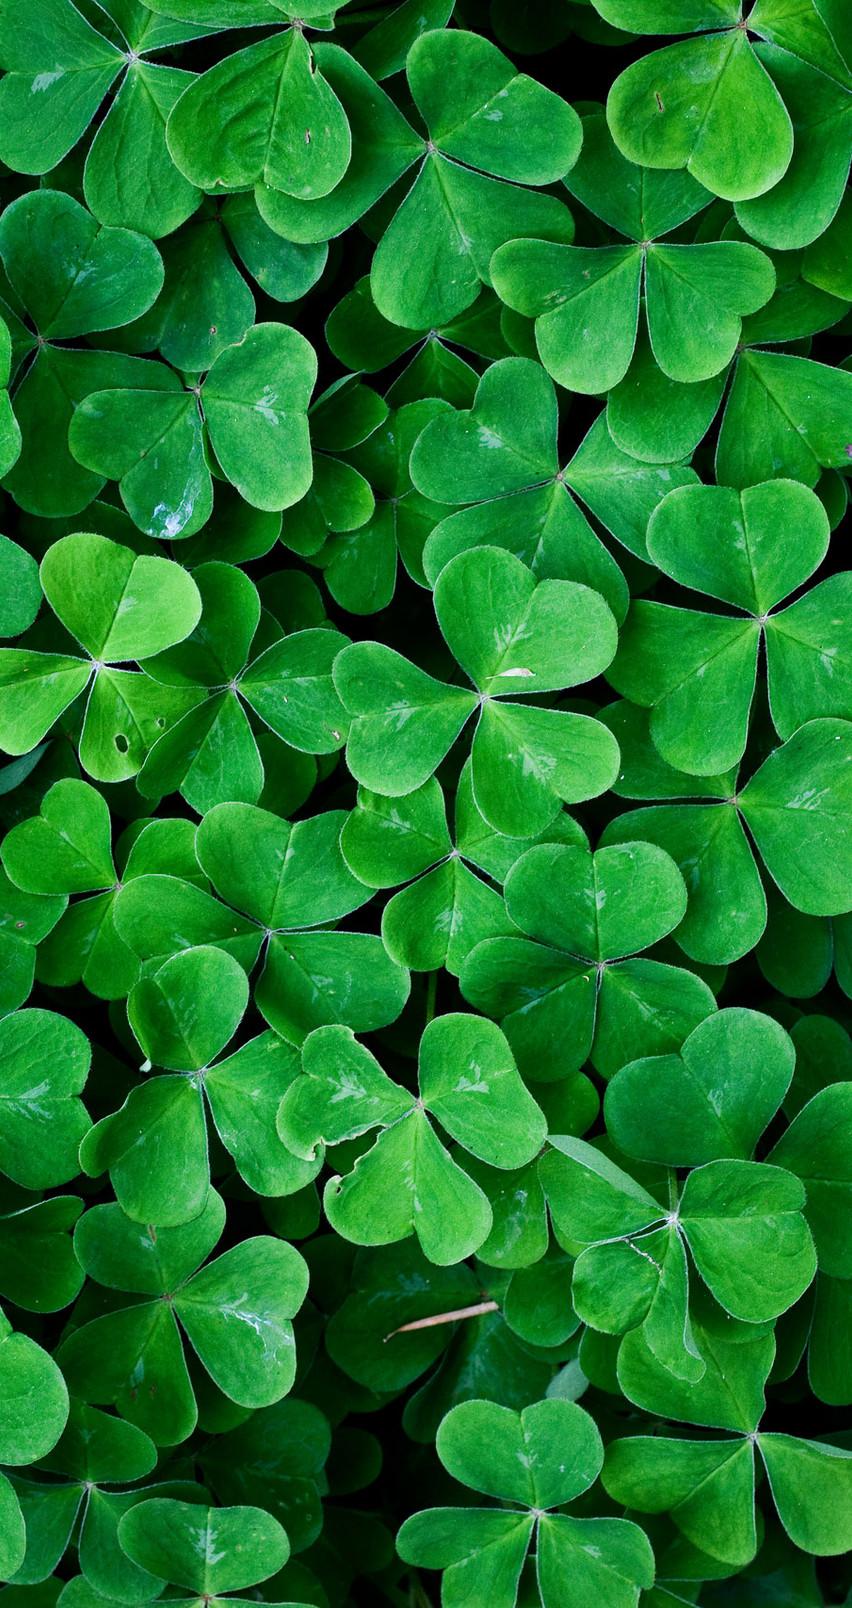 download Green leaf clover wall HD nature wallpaper [852x1608 852x1608